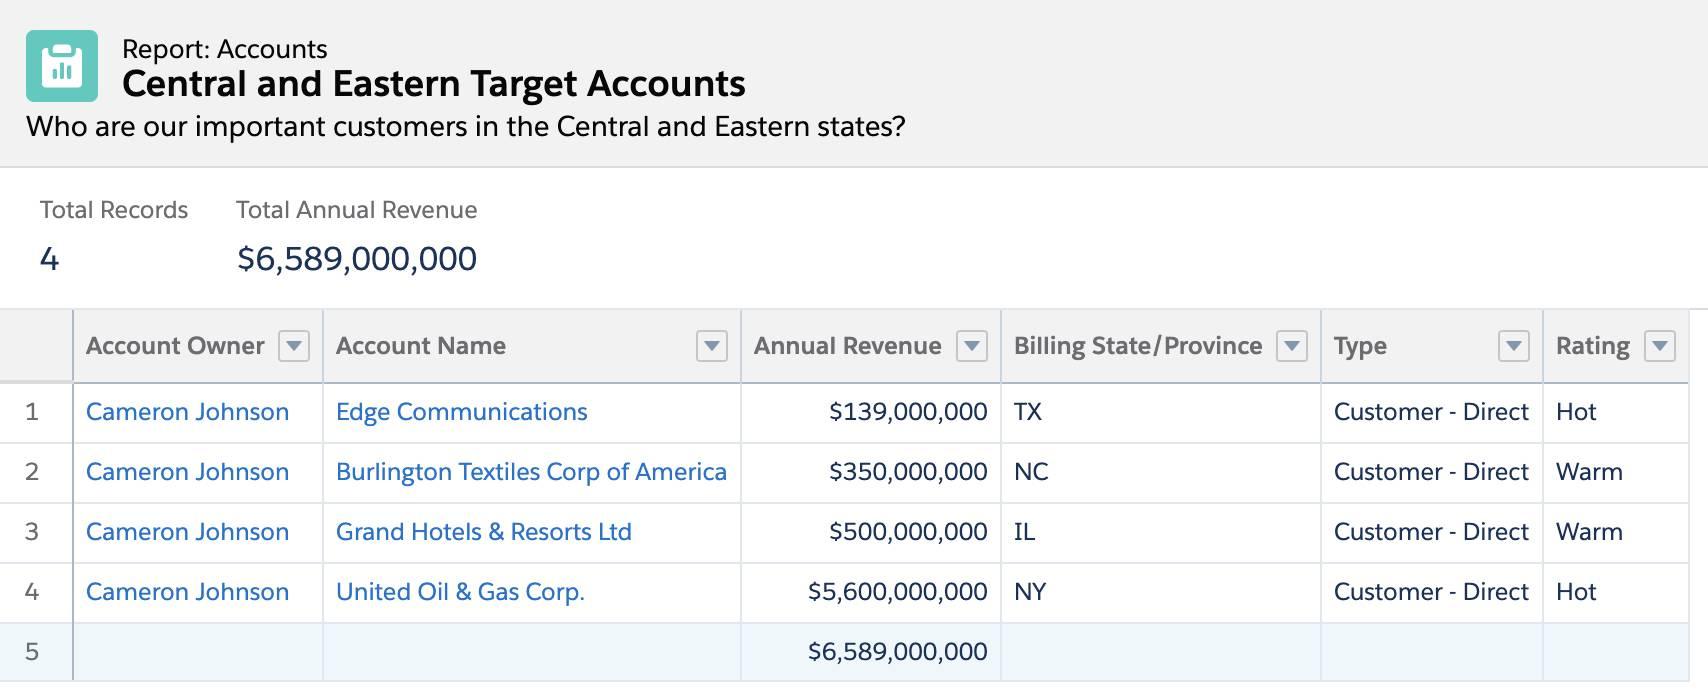 Central Eastern Target Accounts (合衆国中部および東部の重要取引先) レポート